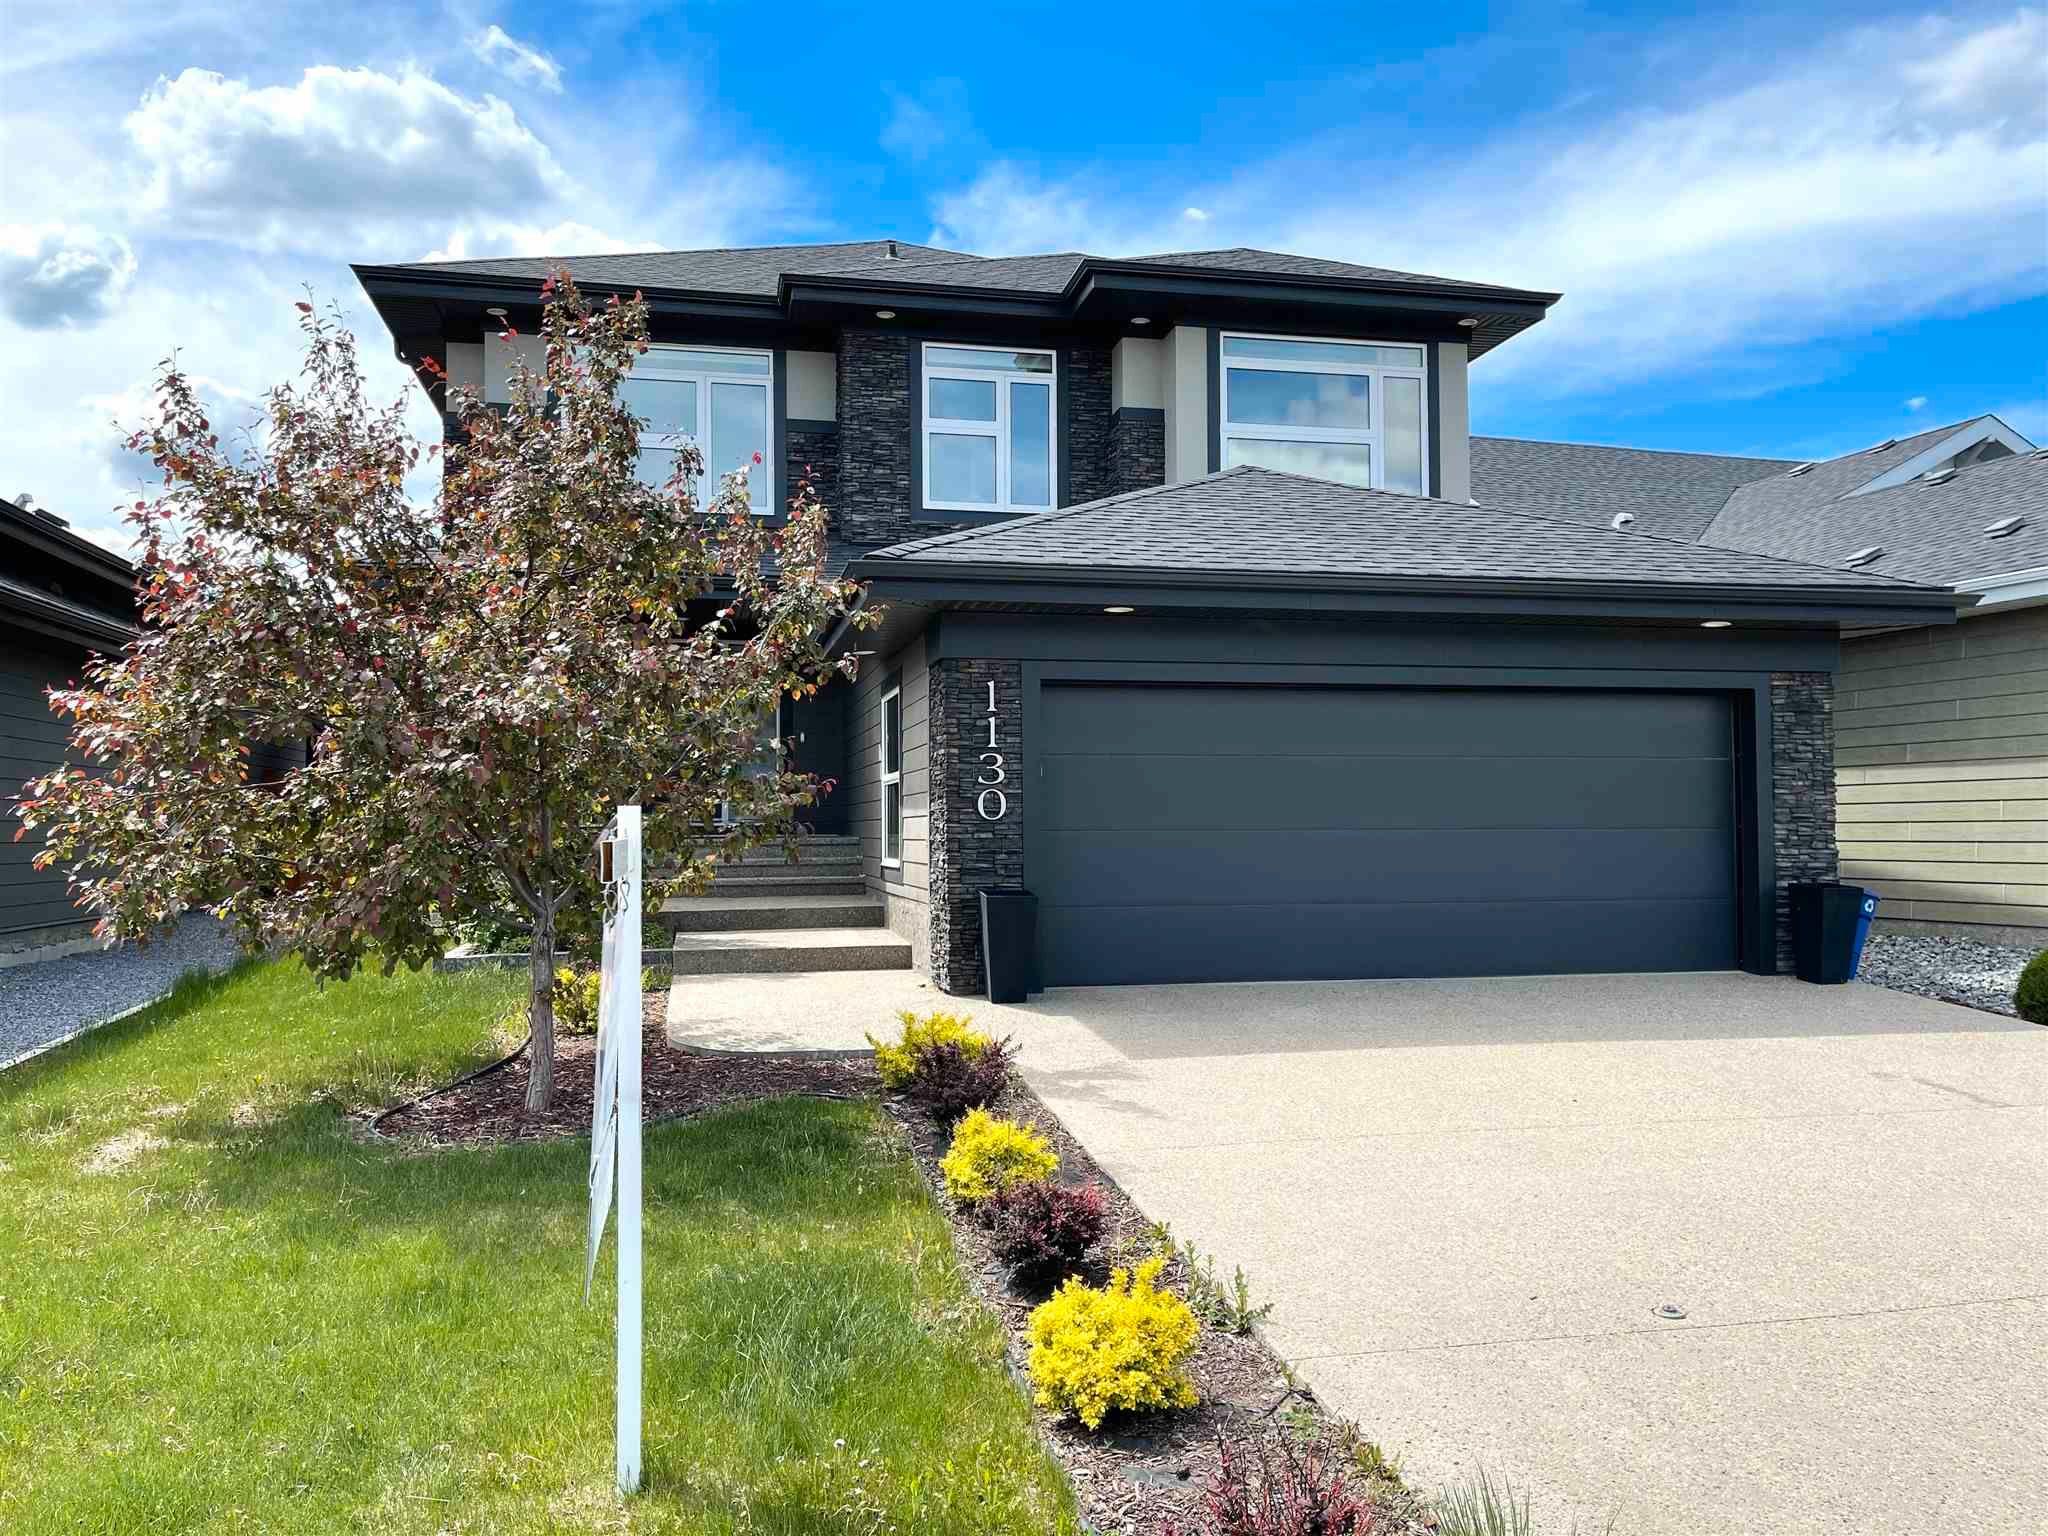 Main Photo: 1130 HAINSTOCK Green in Edmonton: Zone 55 House for sale : MLS®# E4239841